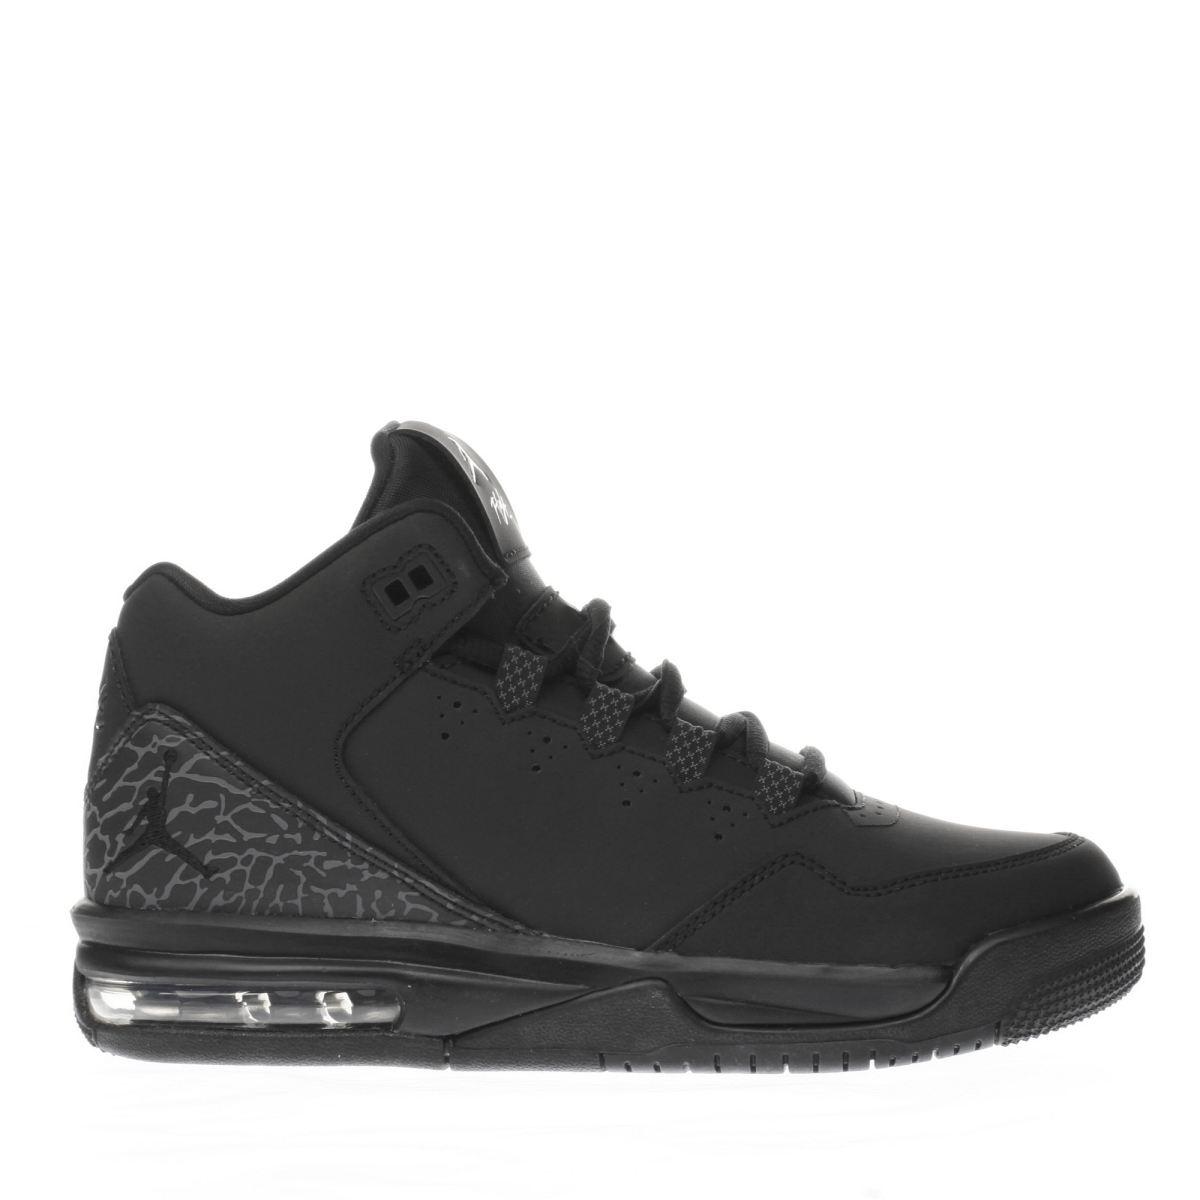 nike jordan Nike Jordan Black Flight Origin Unisex Youth